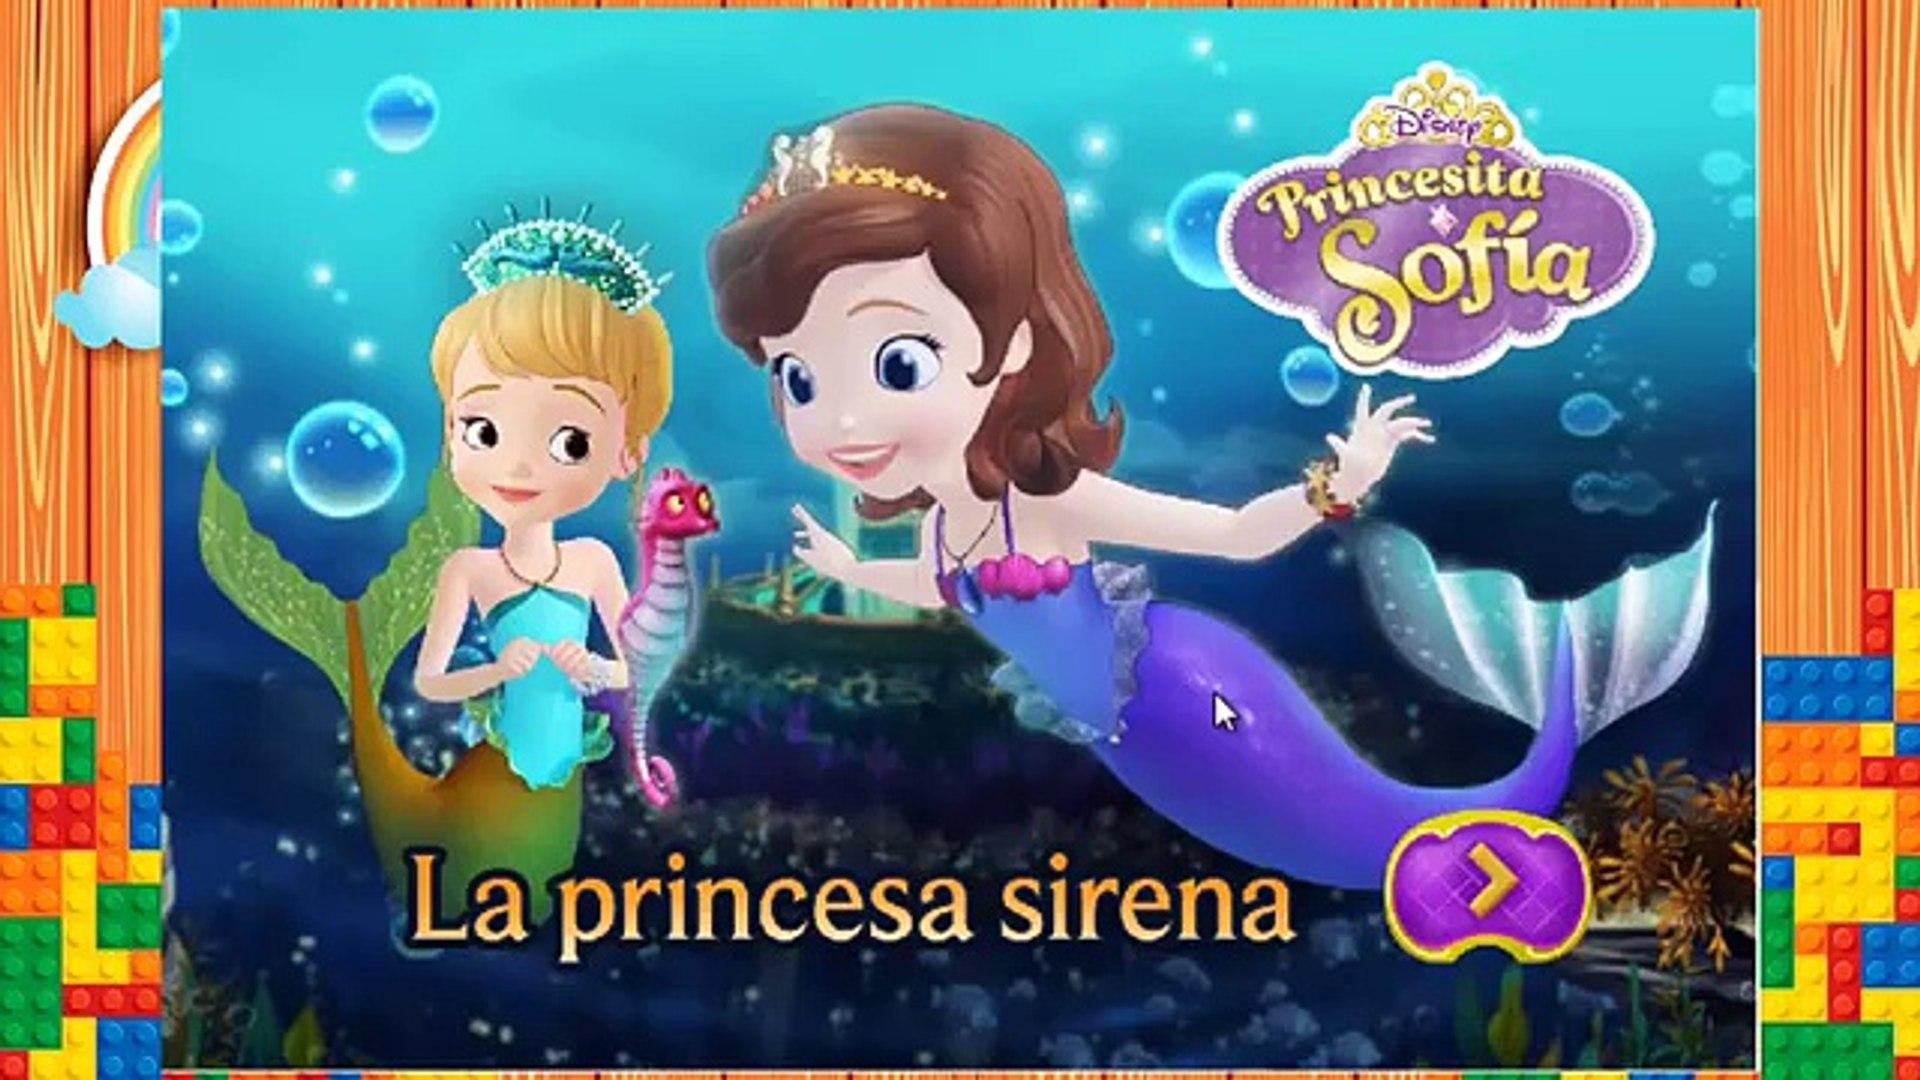 La Princesa Sofia Una Historia De Sirenas Princesita Sofia La Princesa Sirena